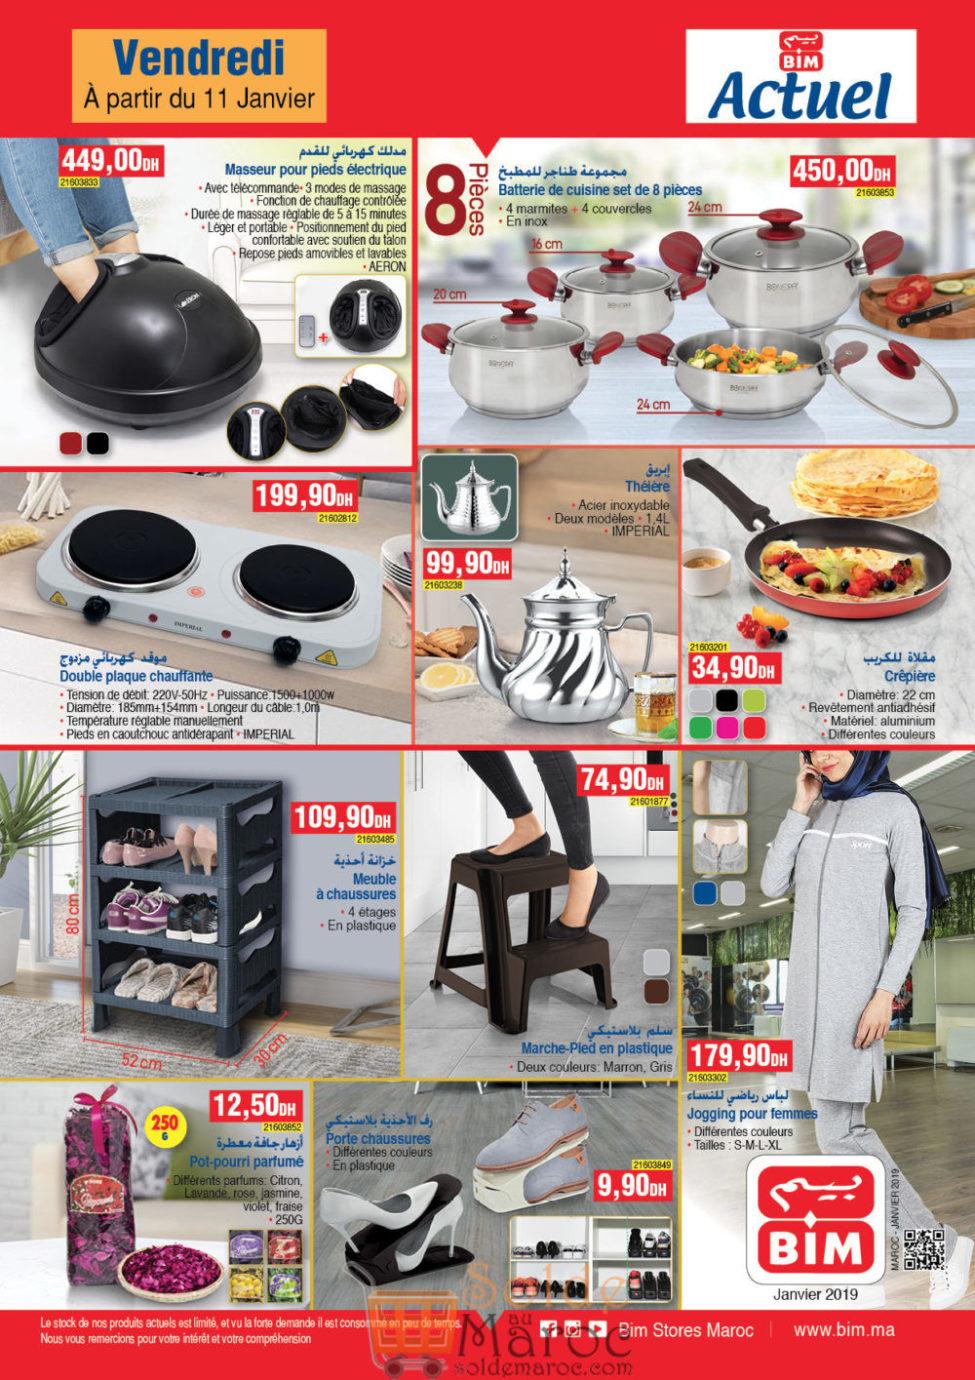 Catalogue Bim Maroc du Vendredi 11 Janvier 2019